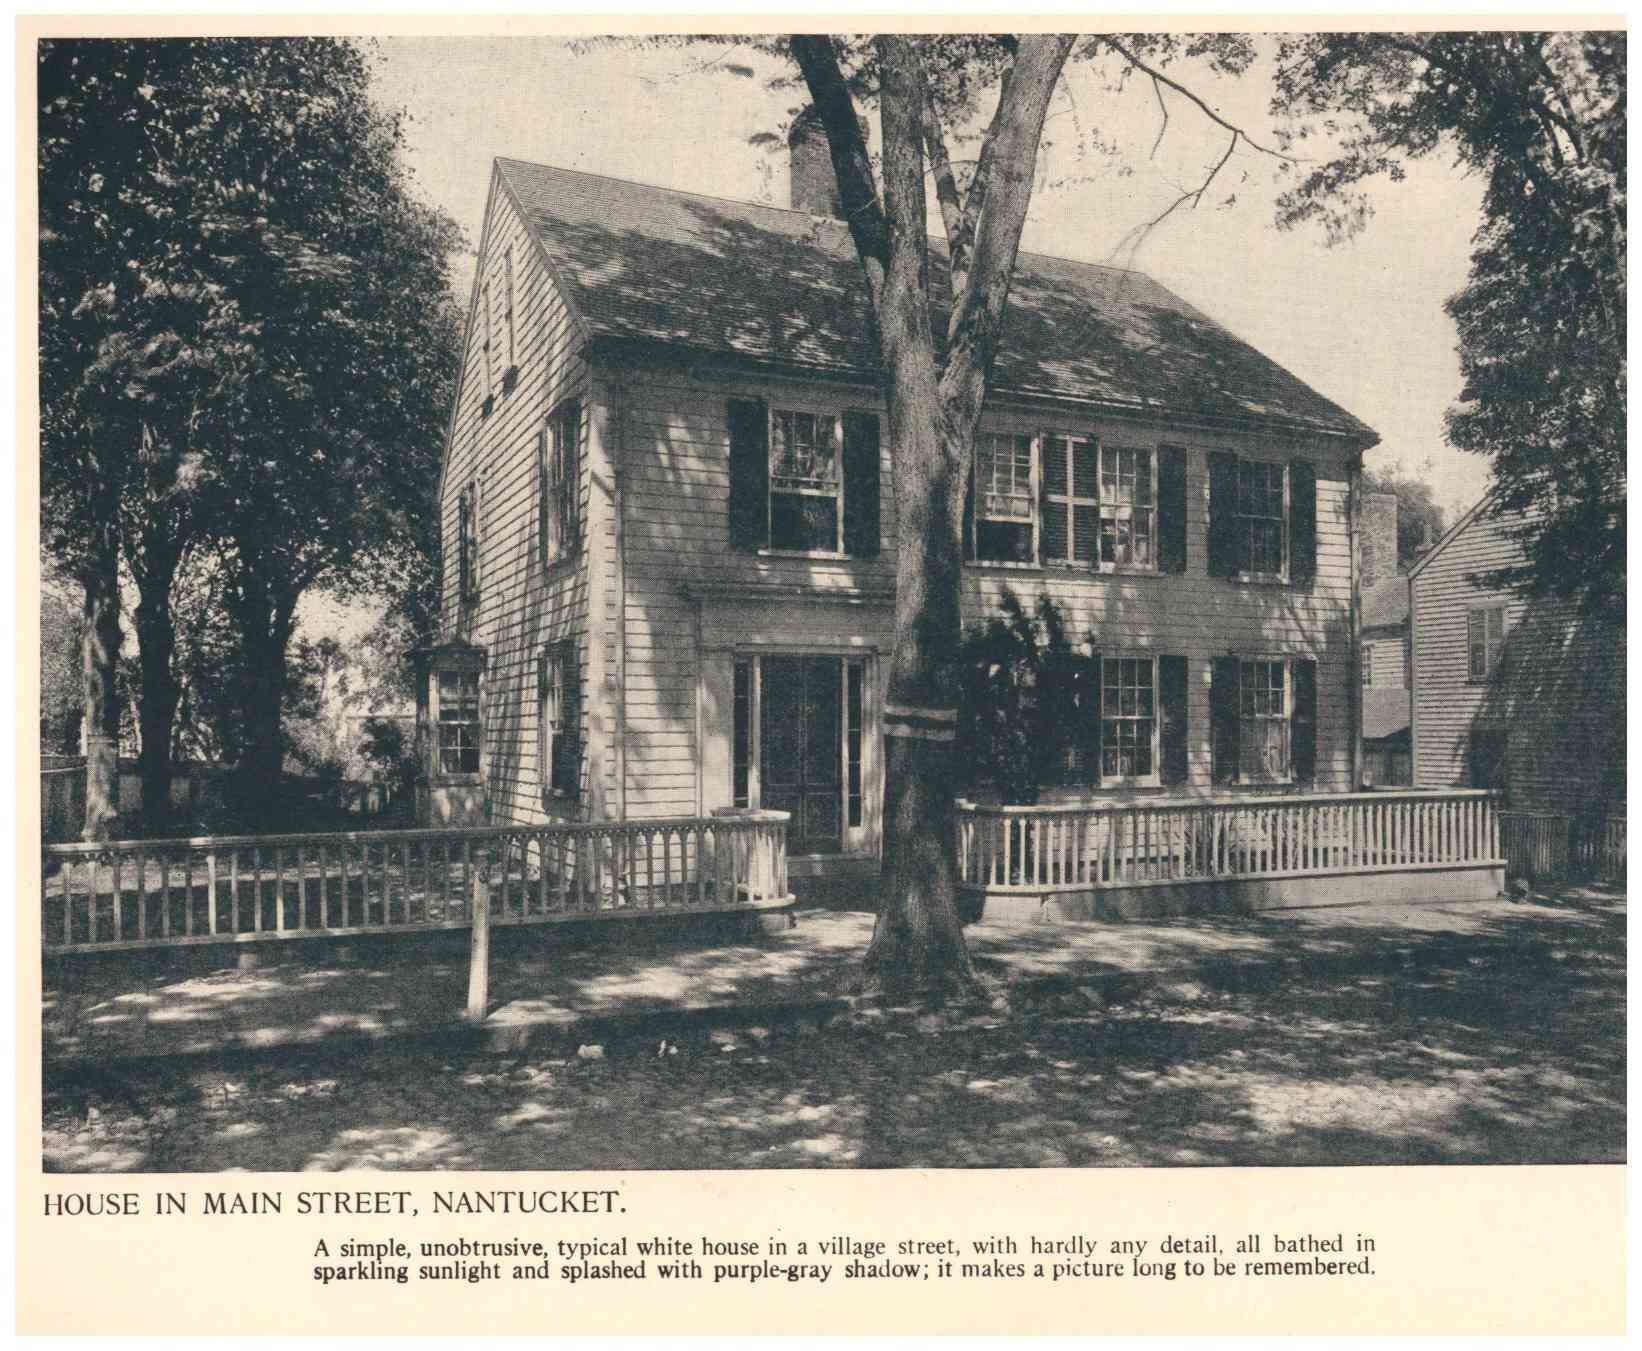 House on Main Street, Nantucket